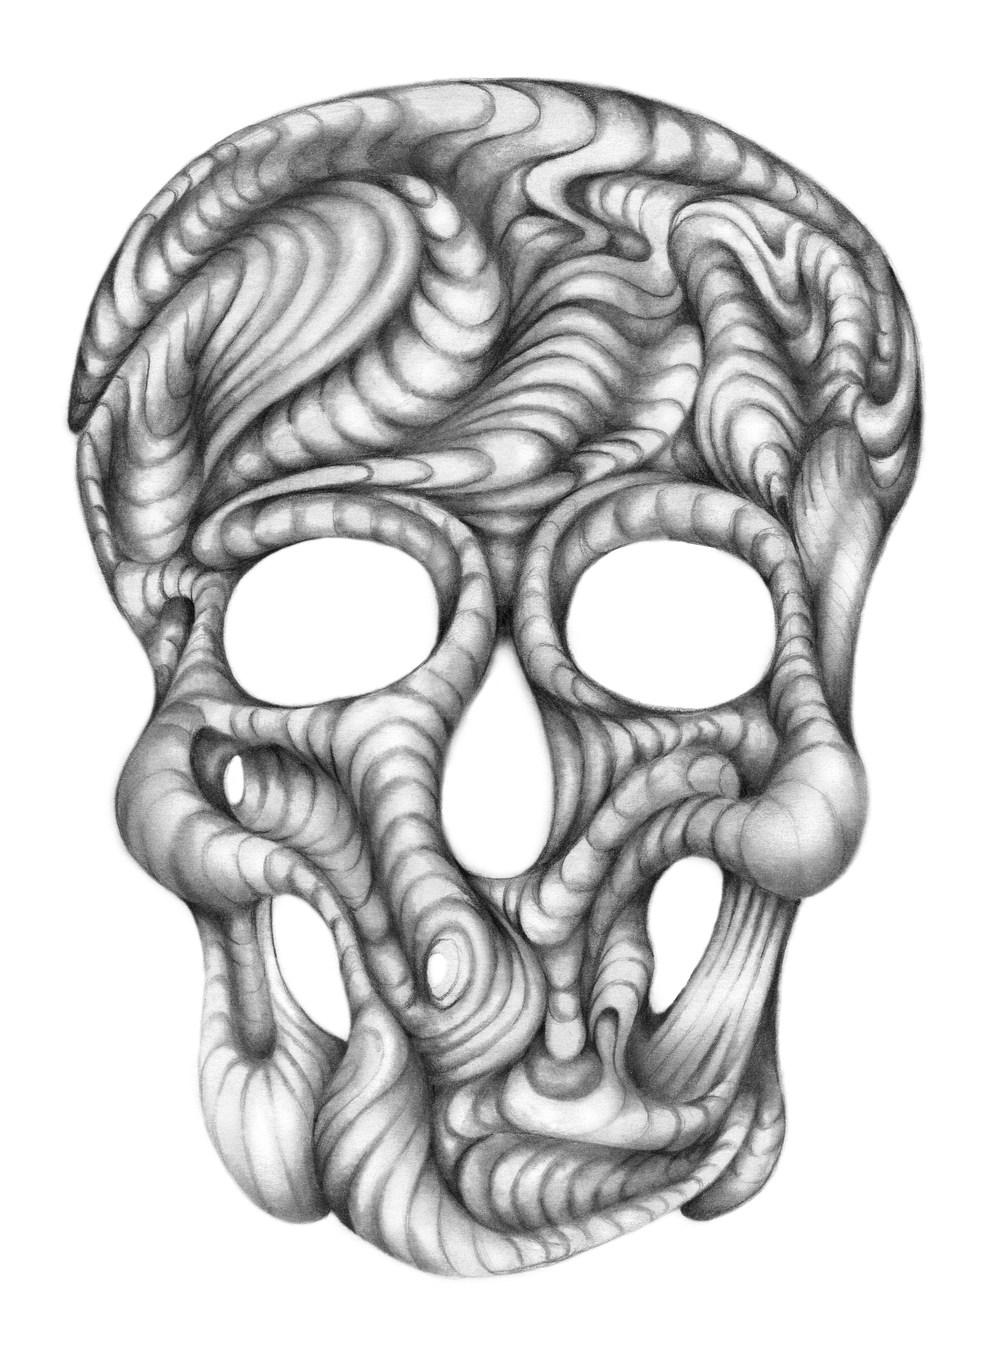 Adrianna+Grezak Skull BW Drawing